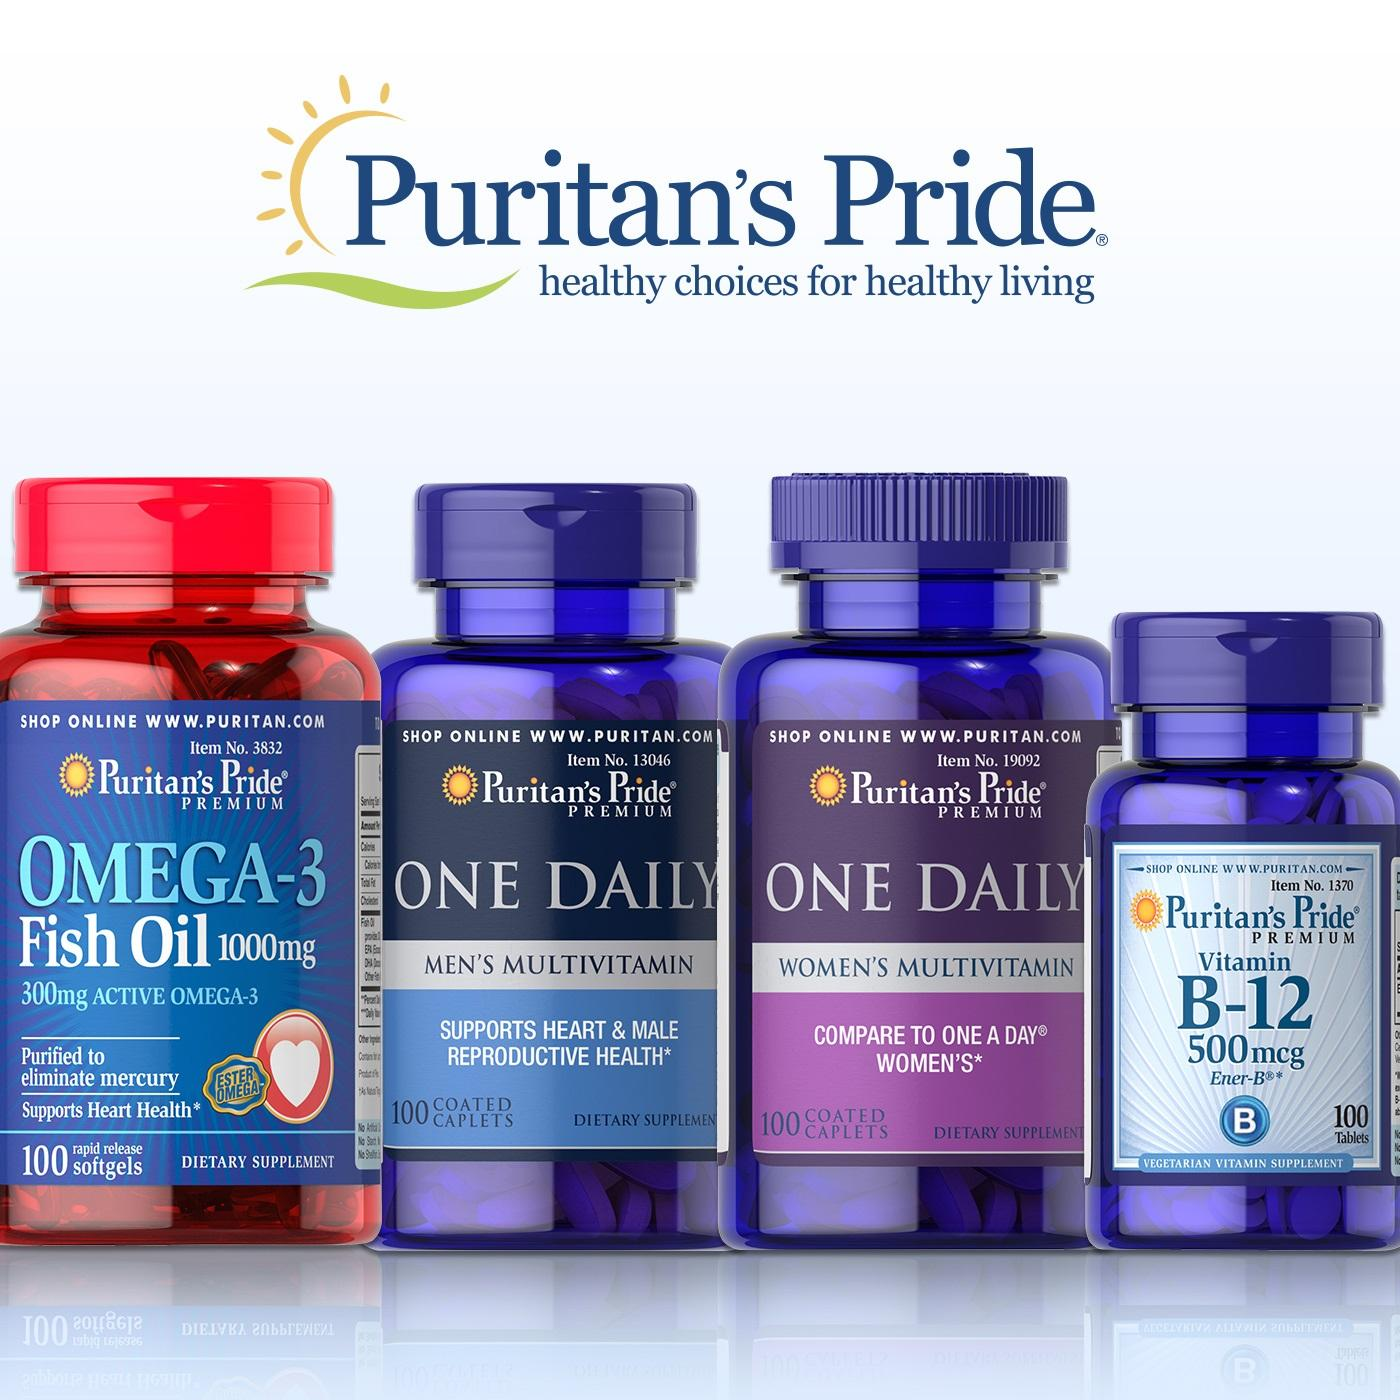 Puritan's Pride 普丽普莱:全场自营保健营养品